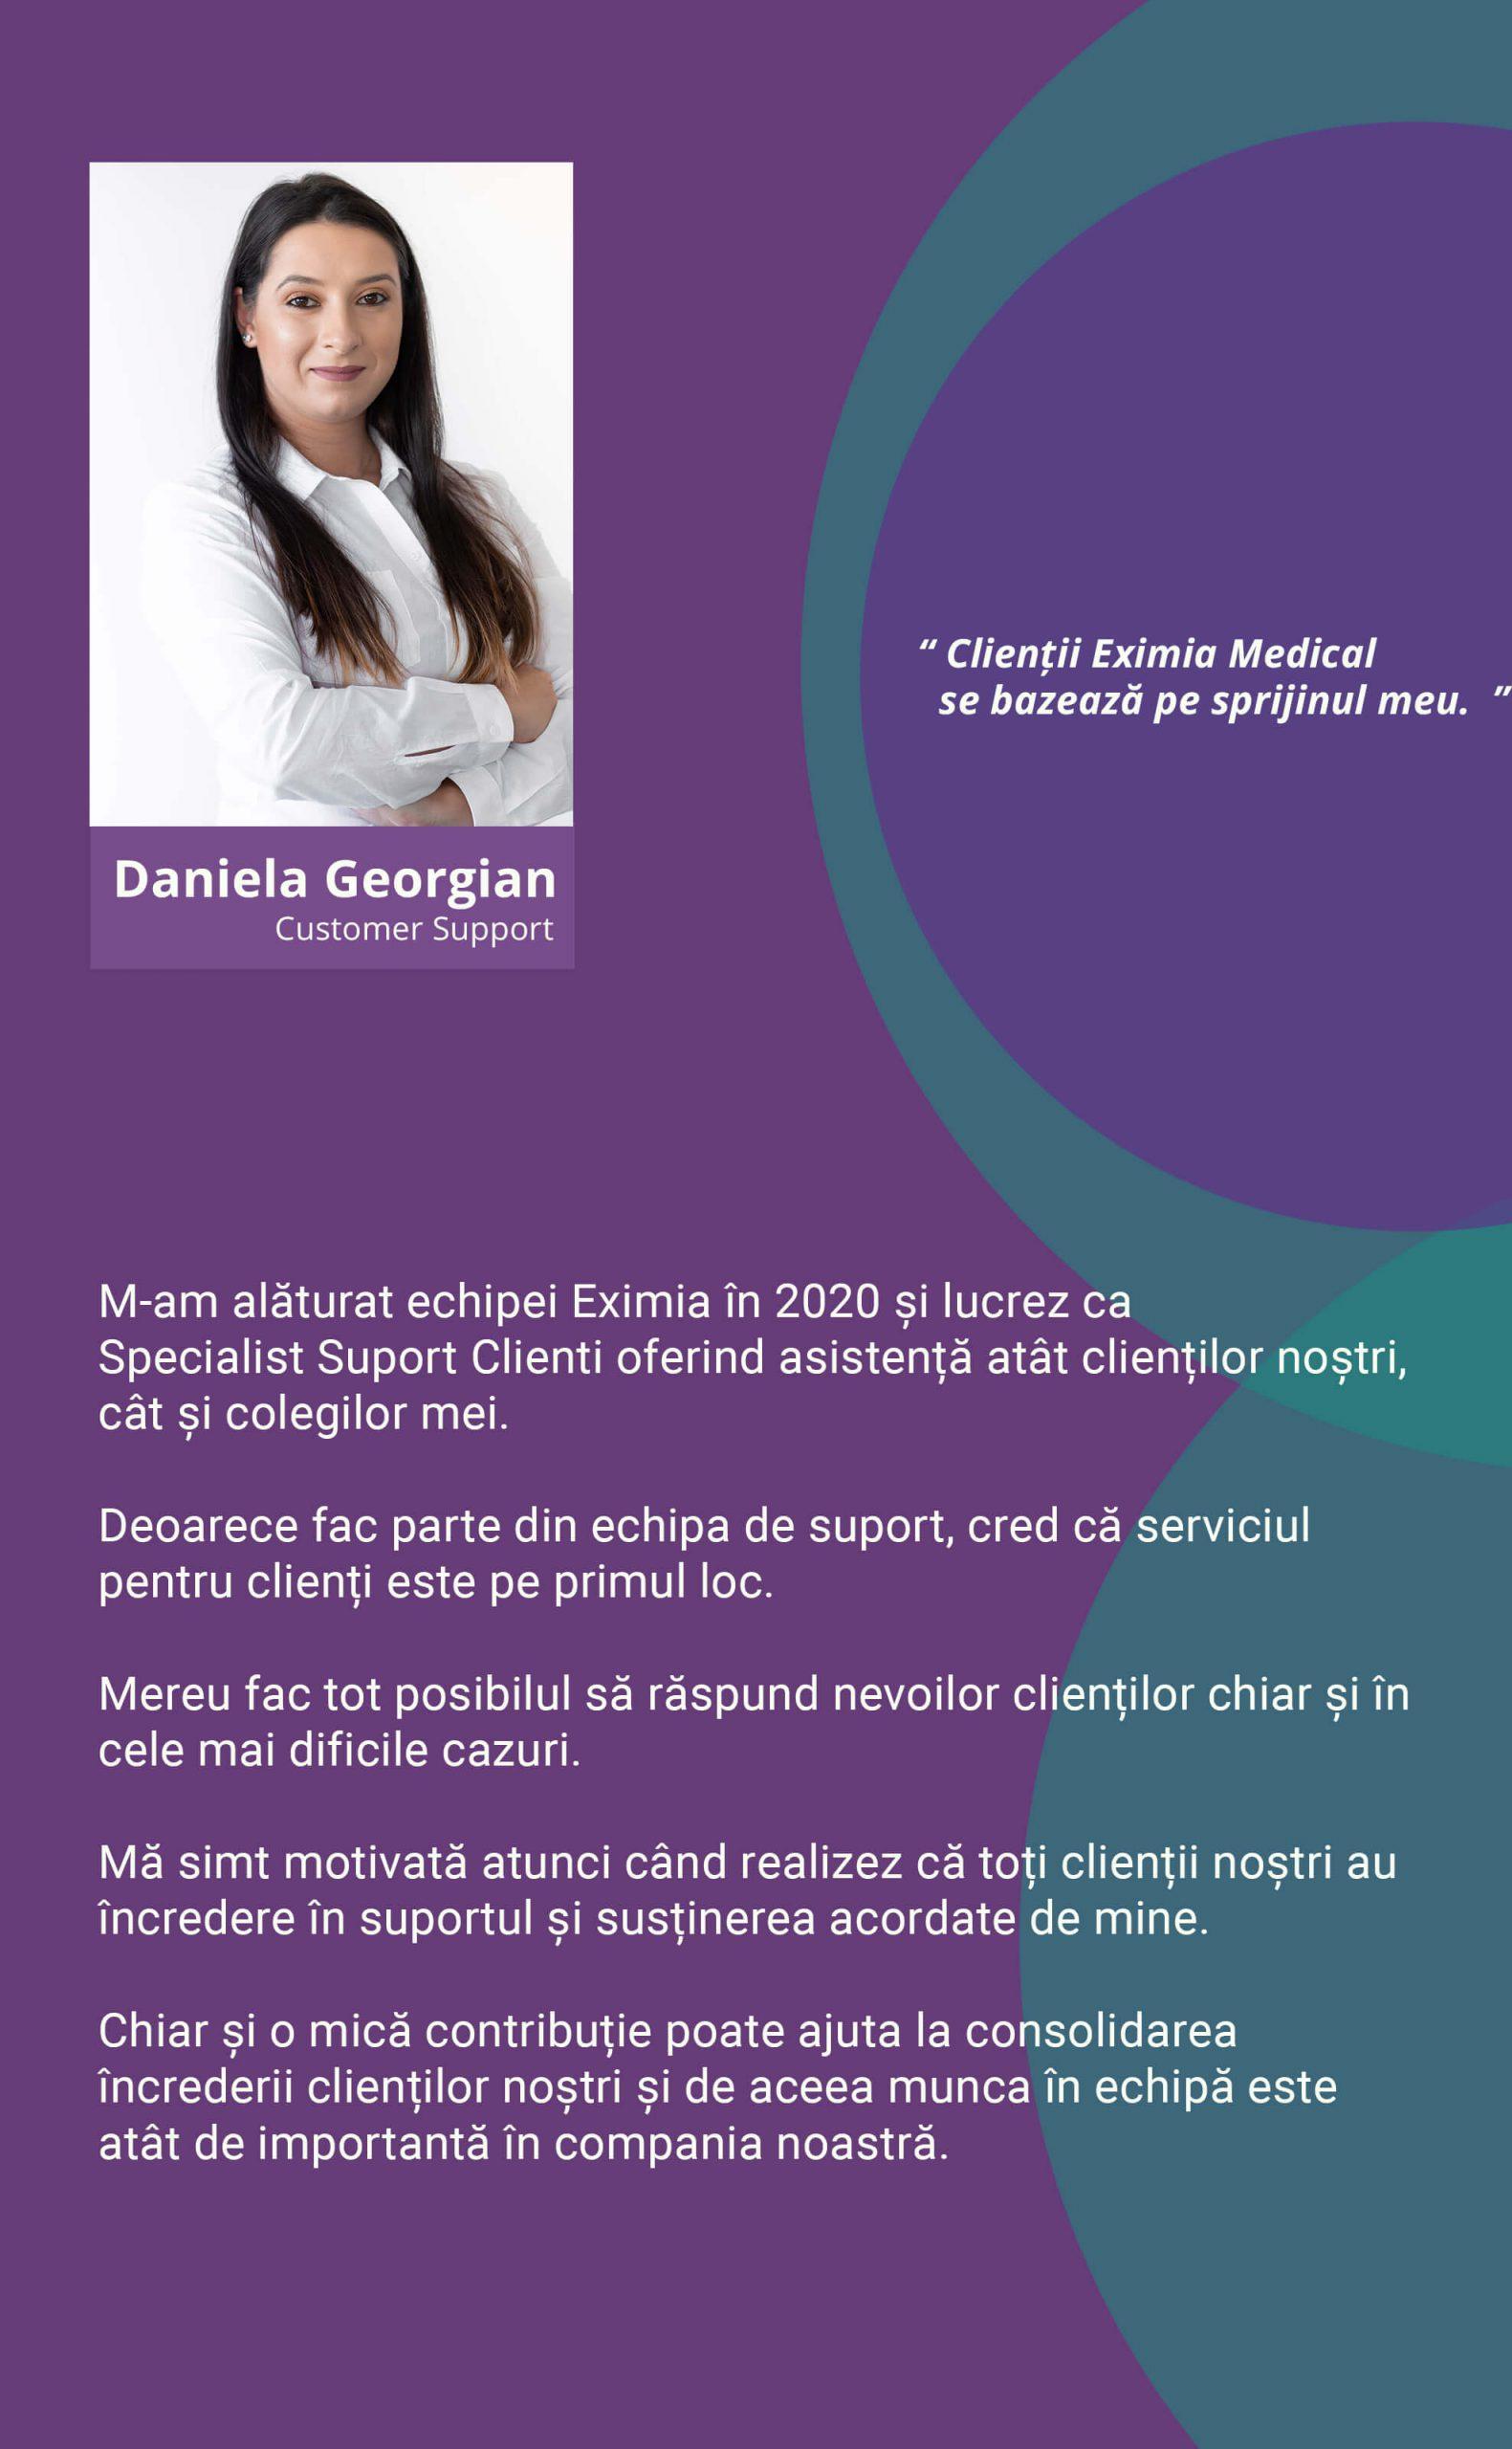 Daniela Georgian